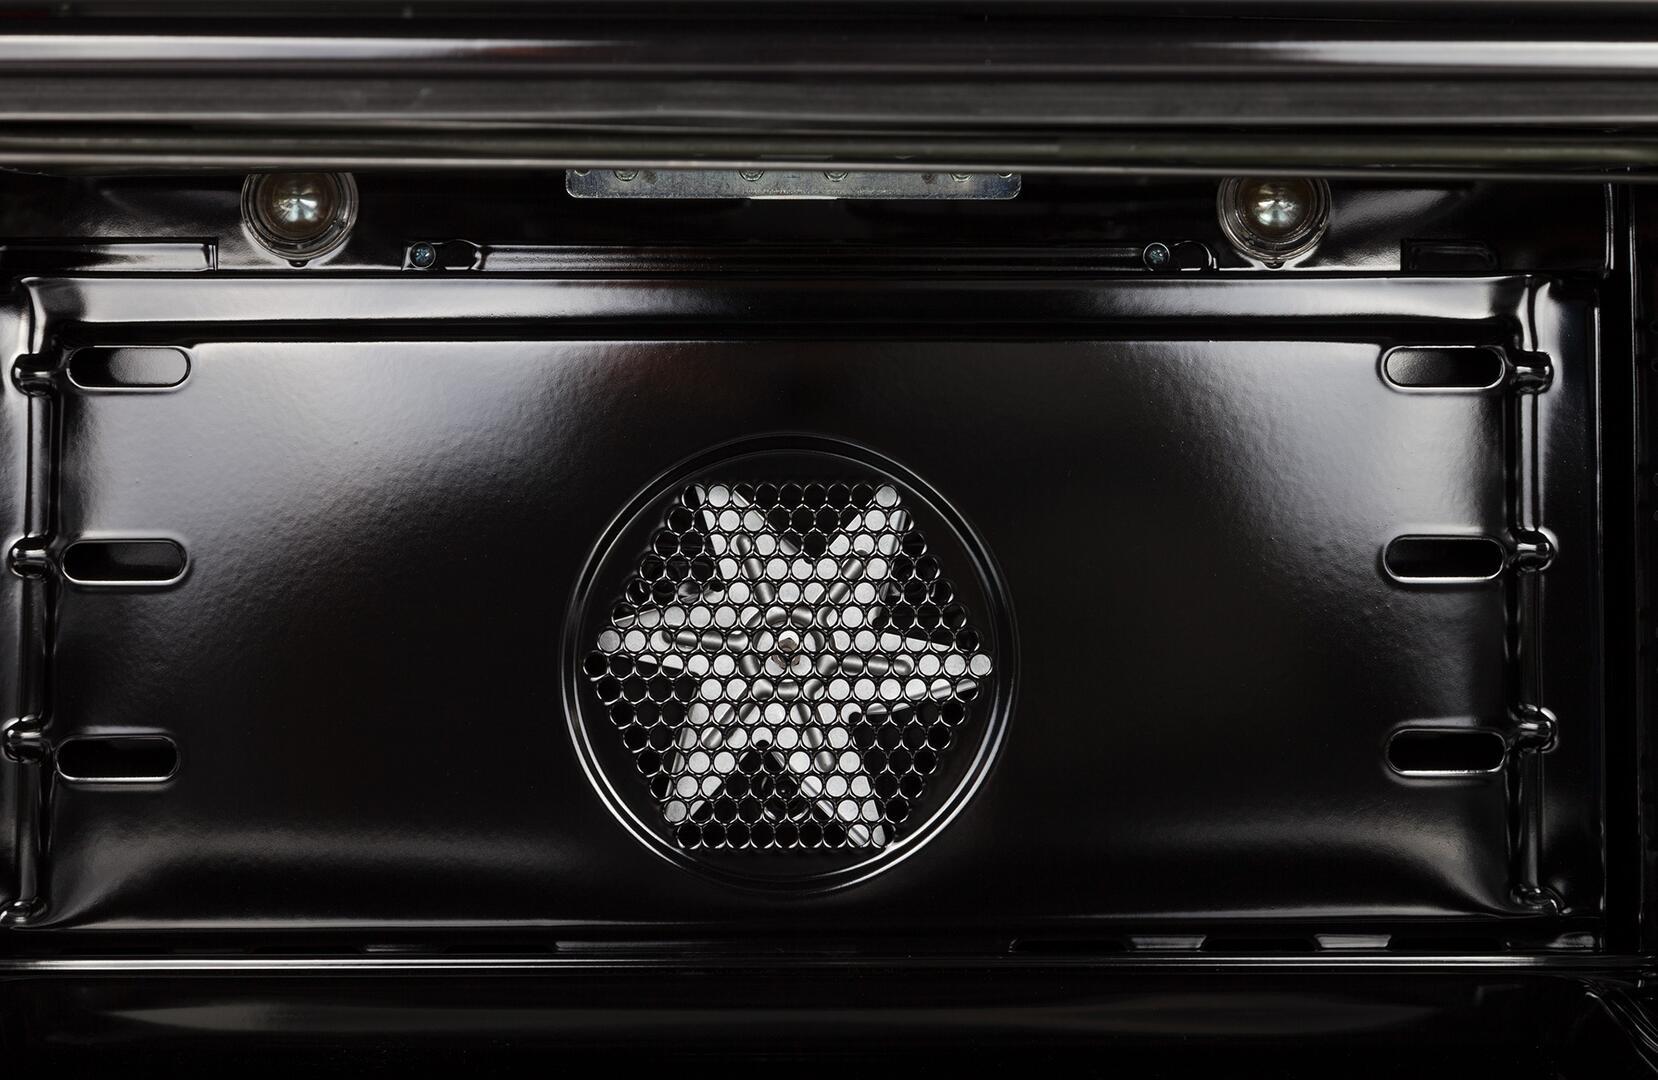 Ilve Professional Plus UPDW100FDMPMLP Freestanding Dual Fuel Range Gray, Interior View